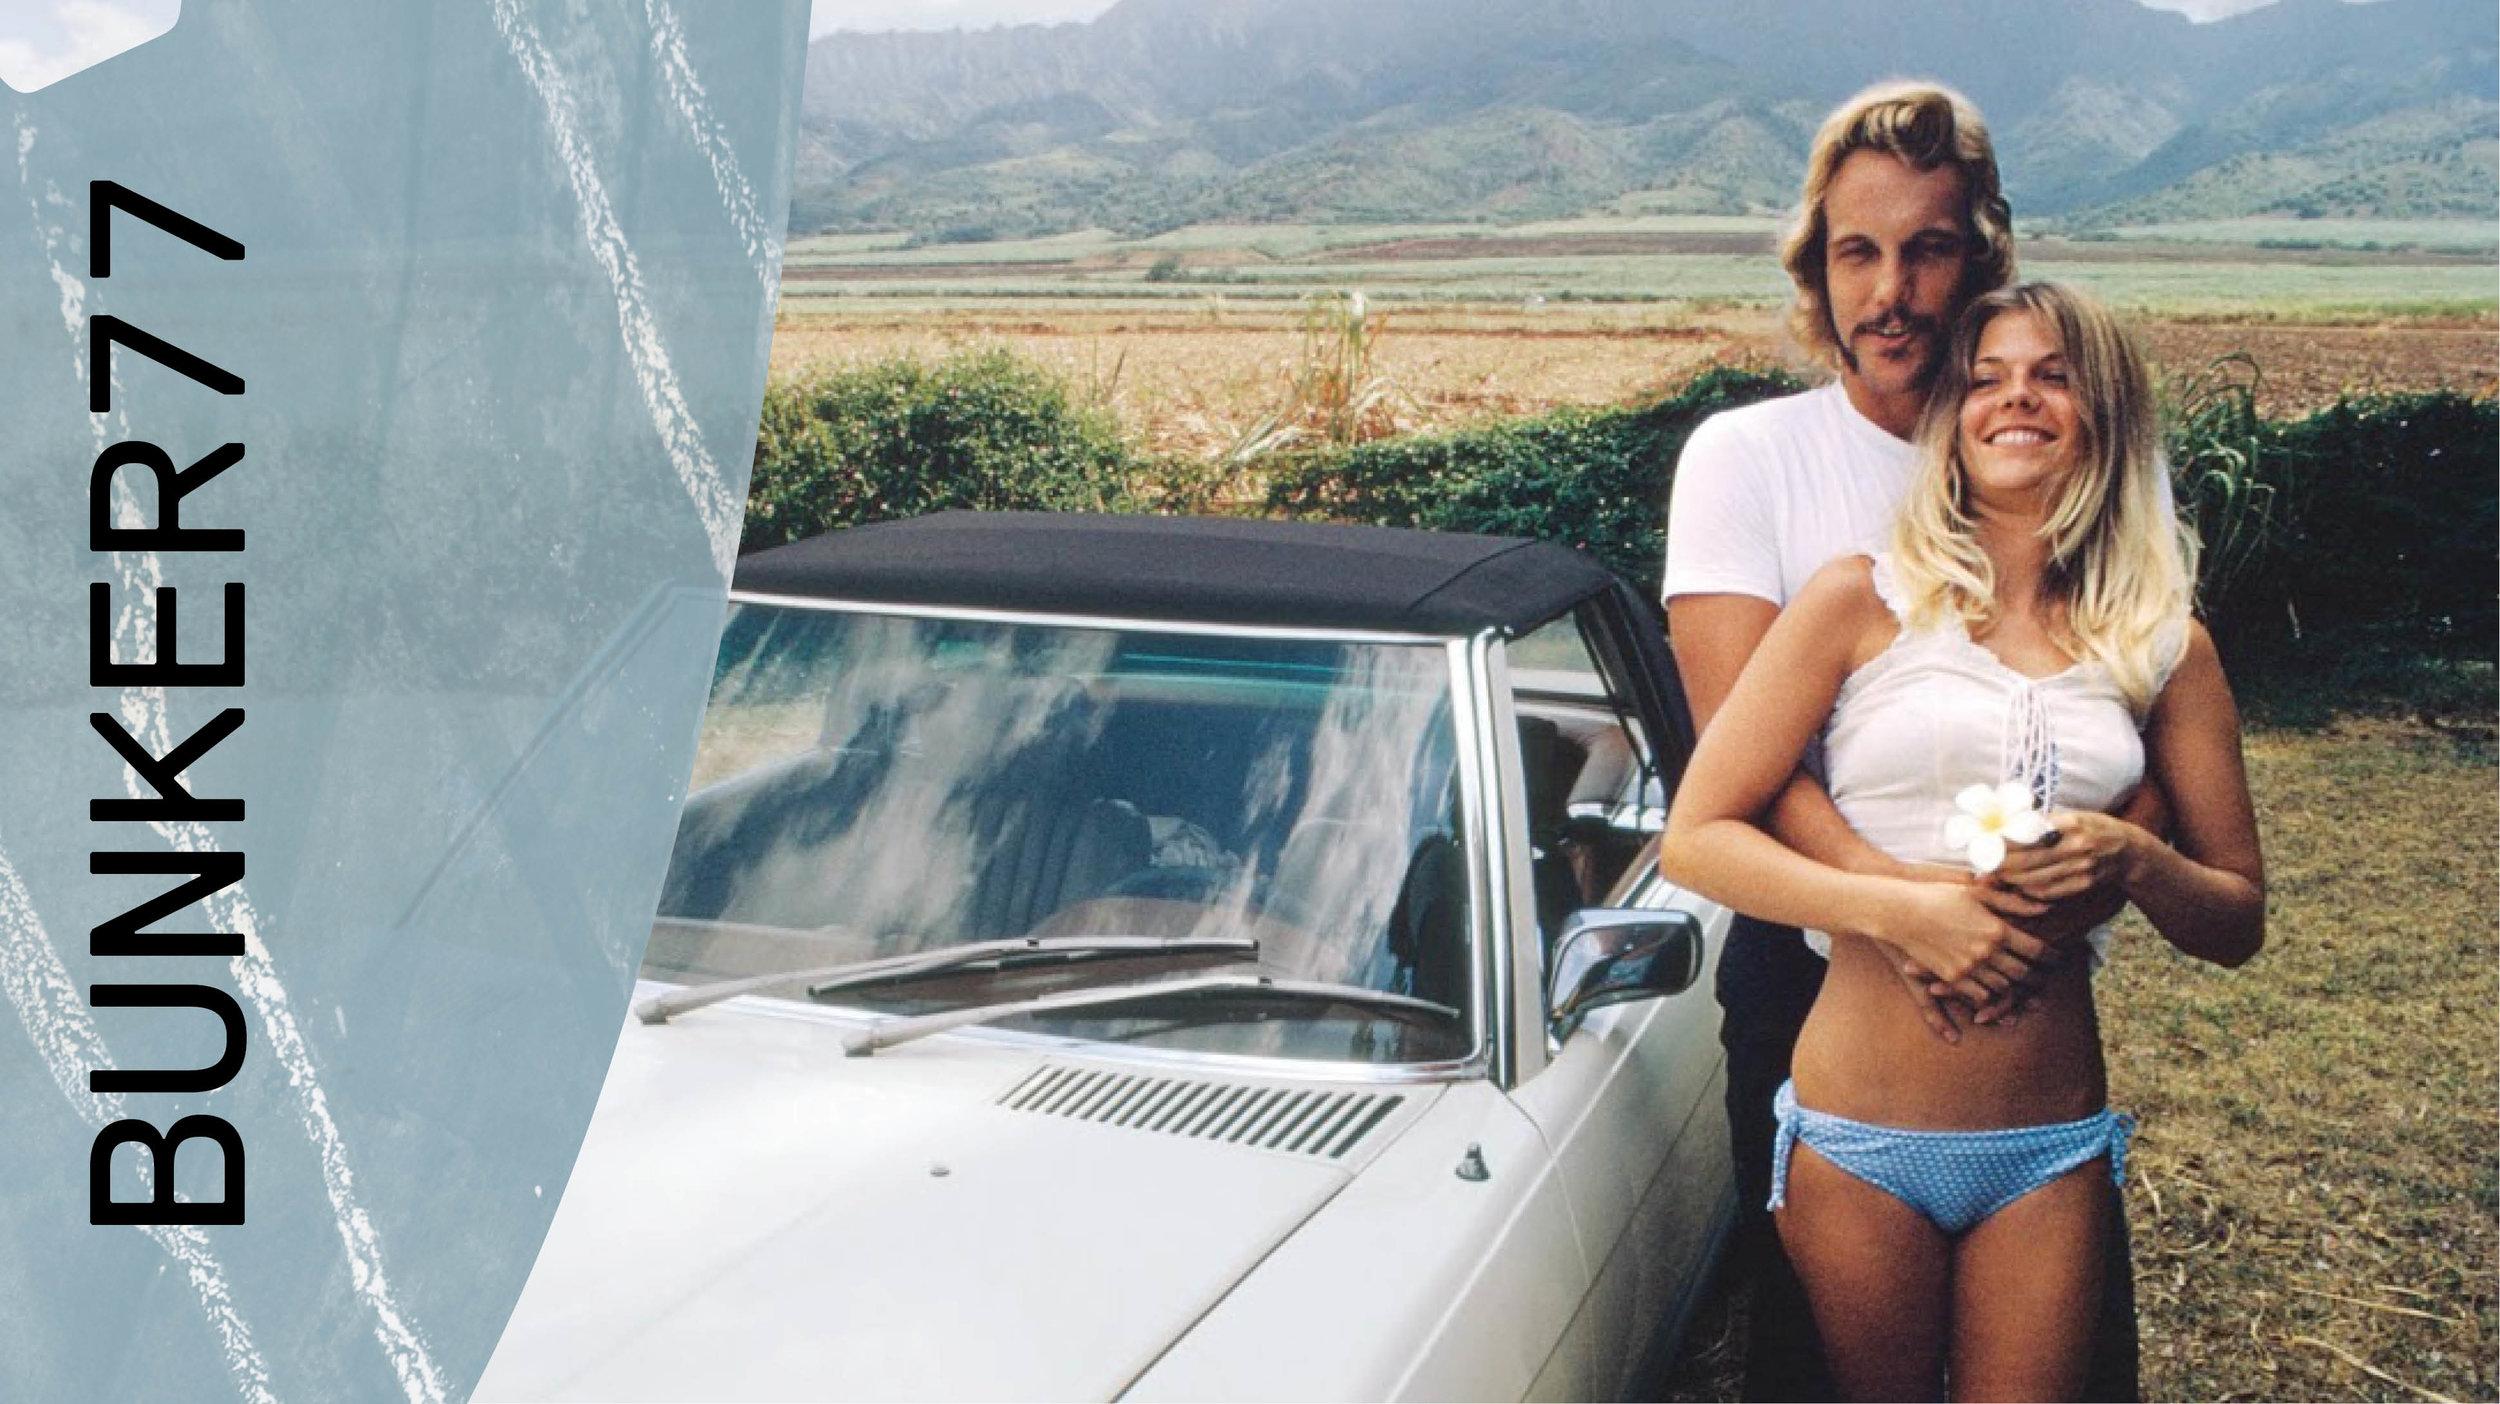 BUNKER77 - The true wild story of a surfing rebel |Dutch Premiere